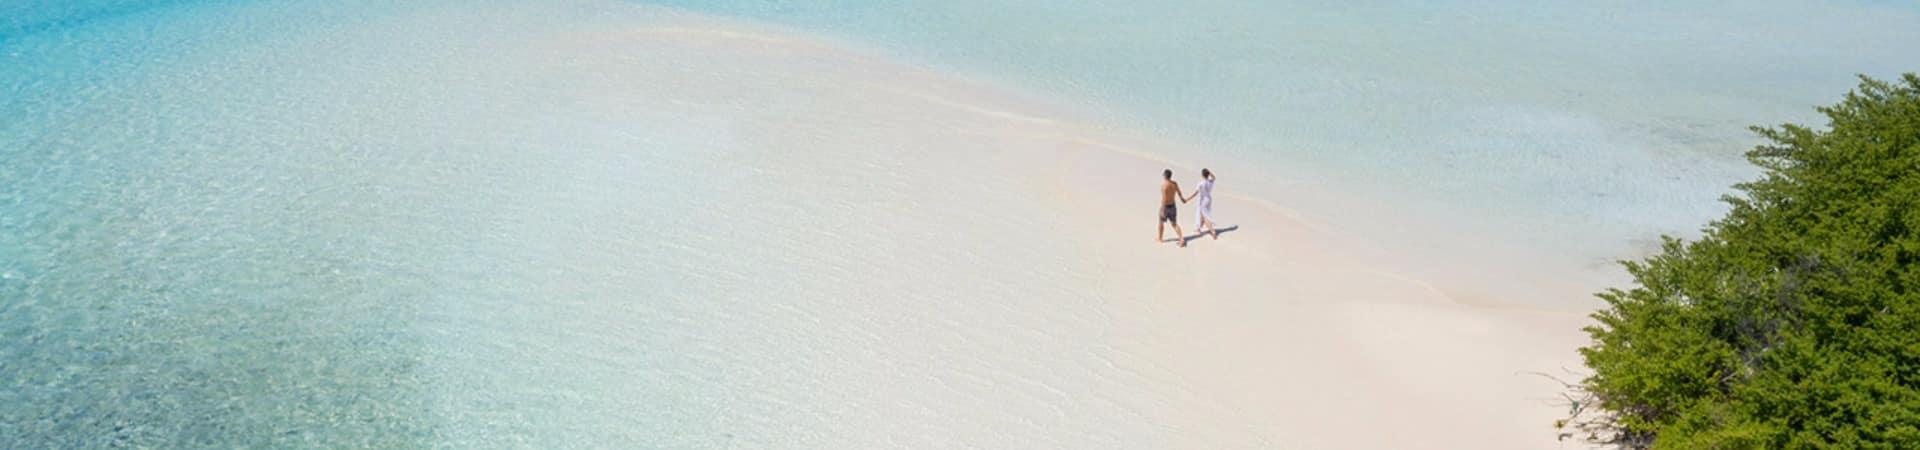 Pullman_Maldives_Maamutaa_banco de areia